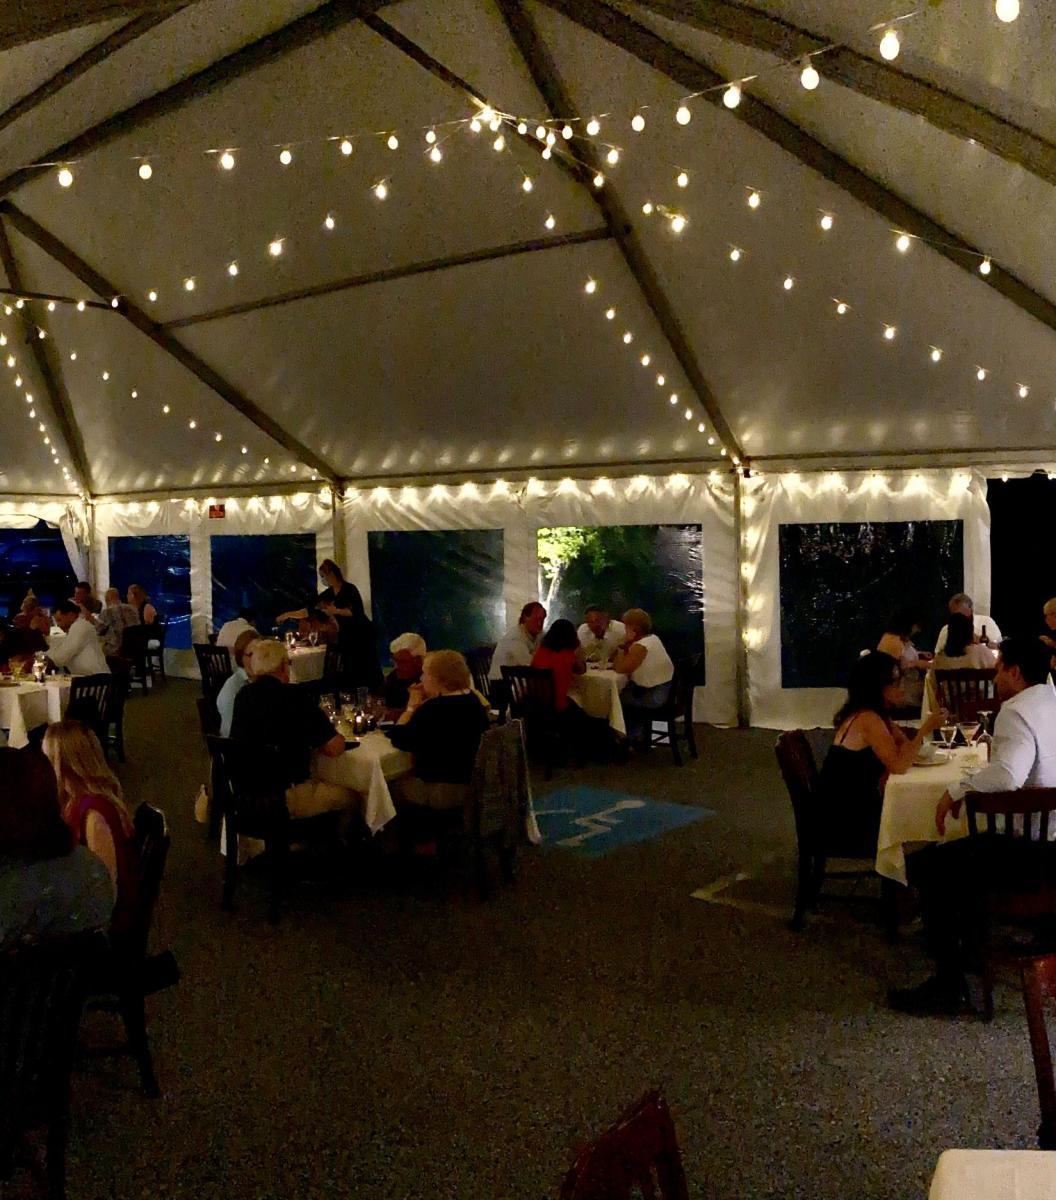 Creeds seafood & steak heated tent